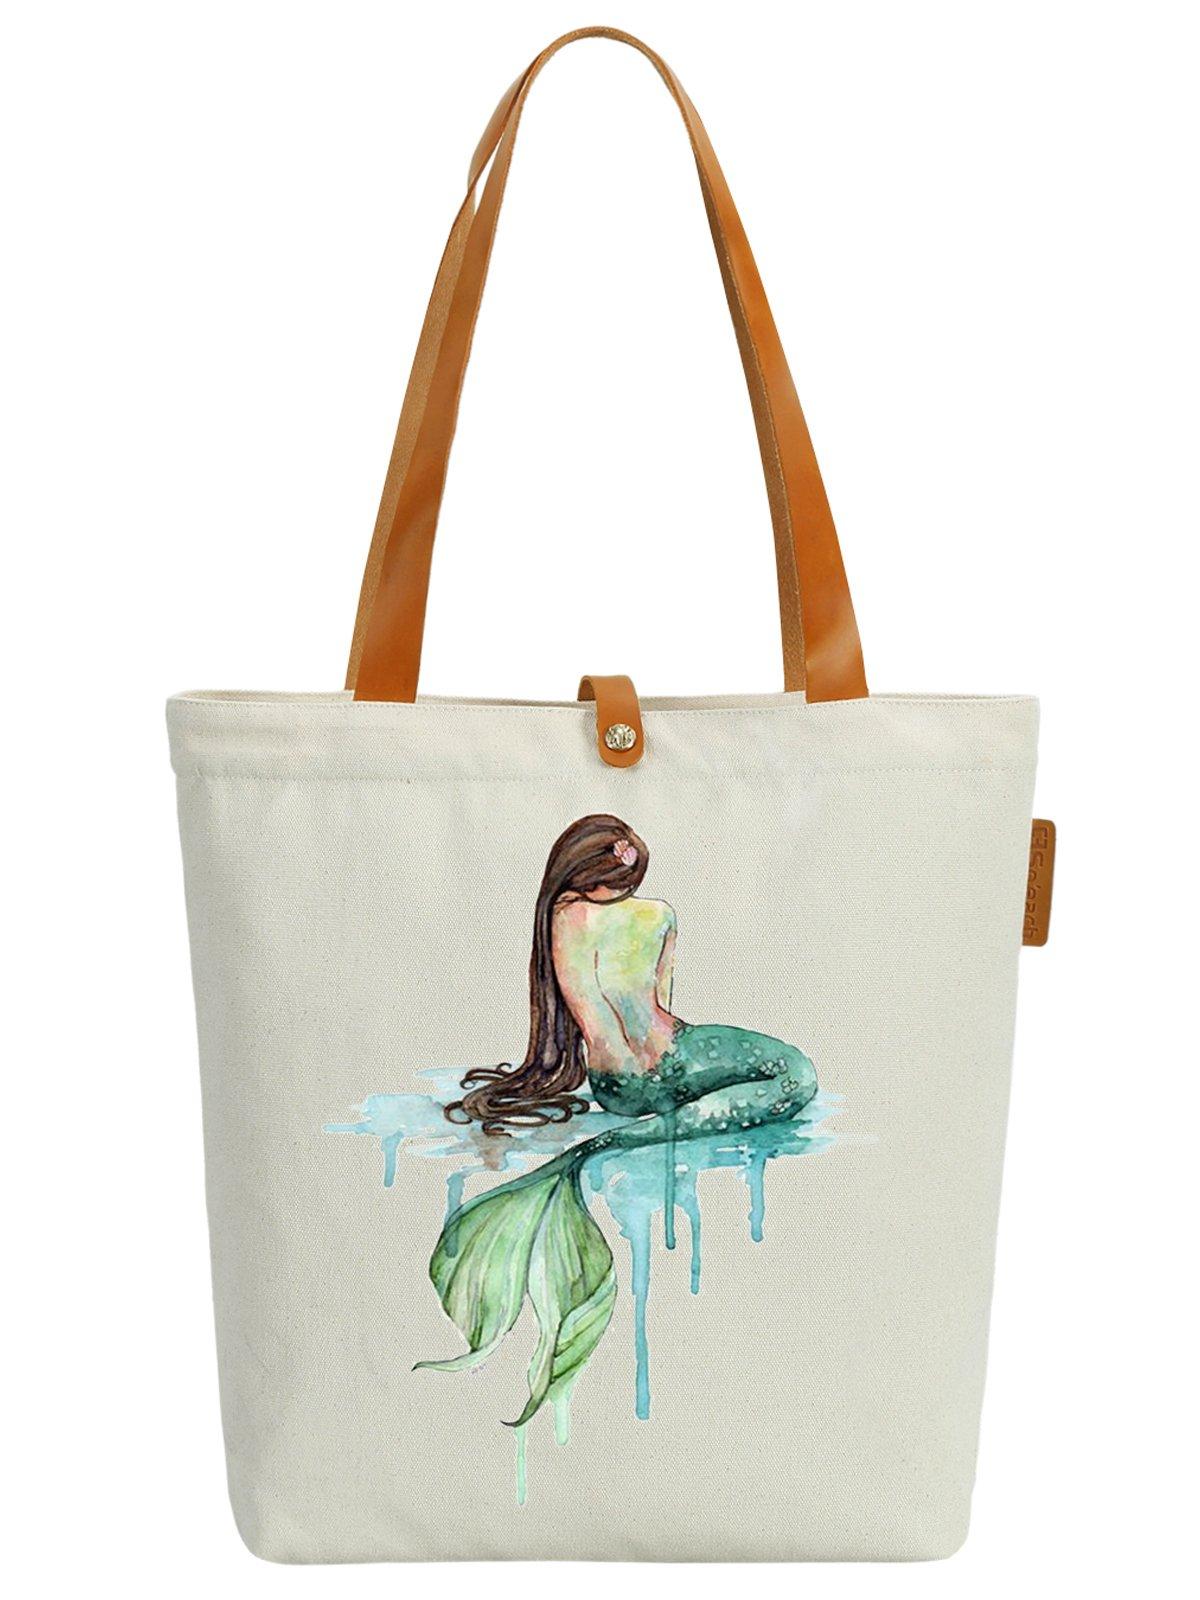 So'each Women's Mermaid Art Pattern Graphic Top Handle Canvas Tote Shoulder Bag